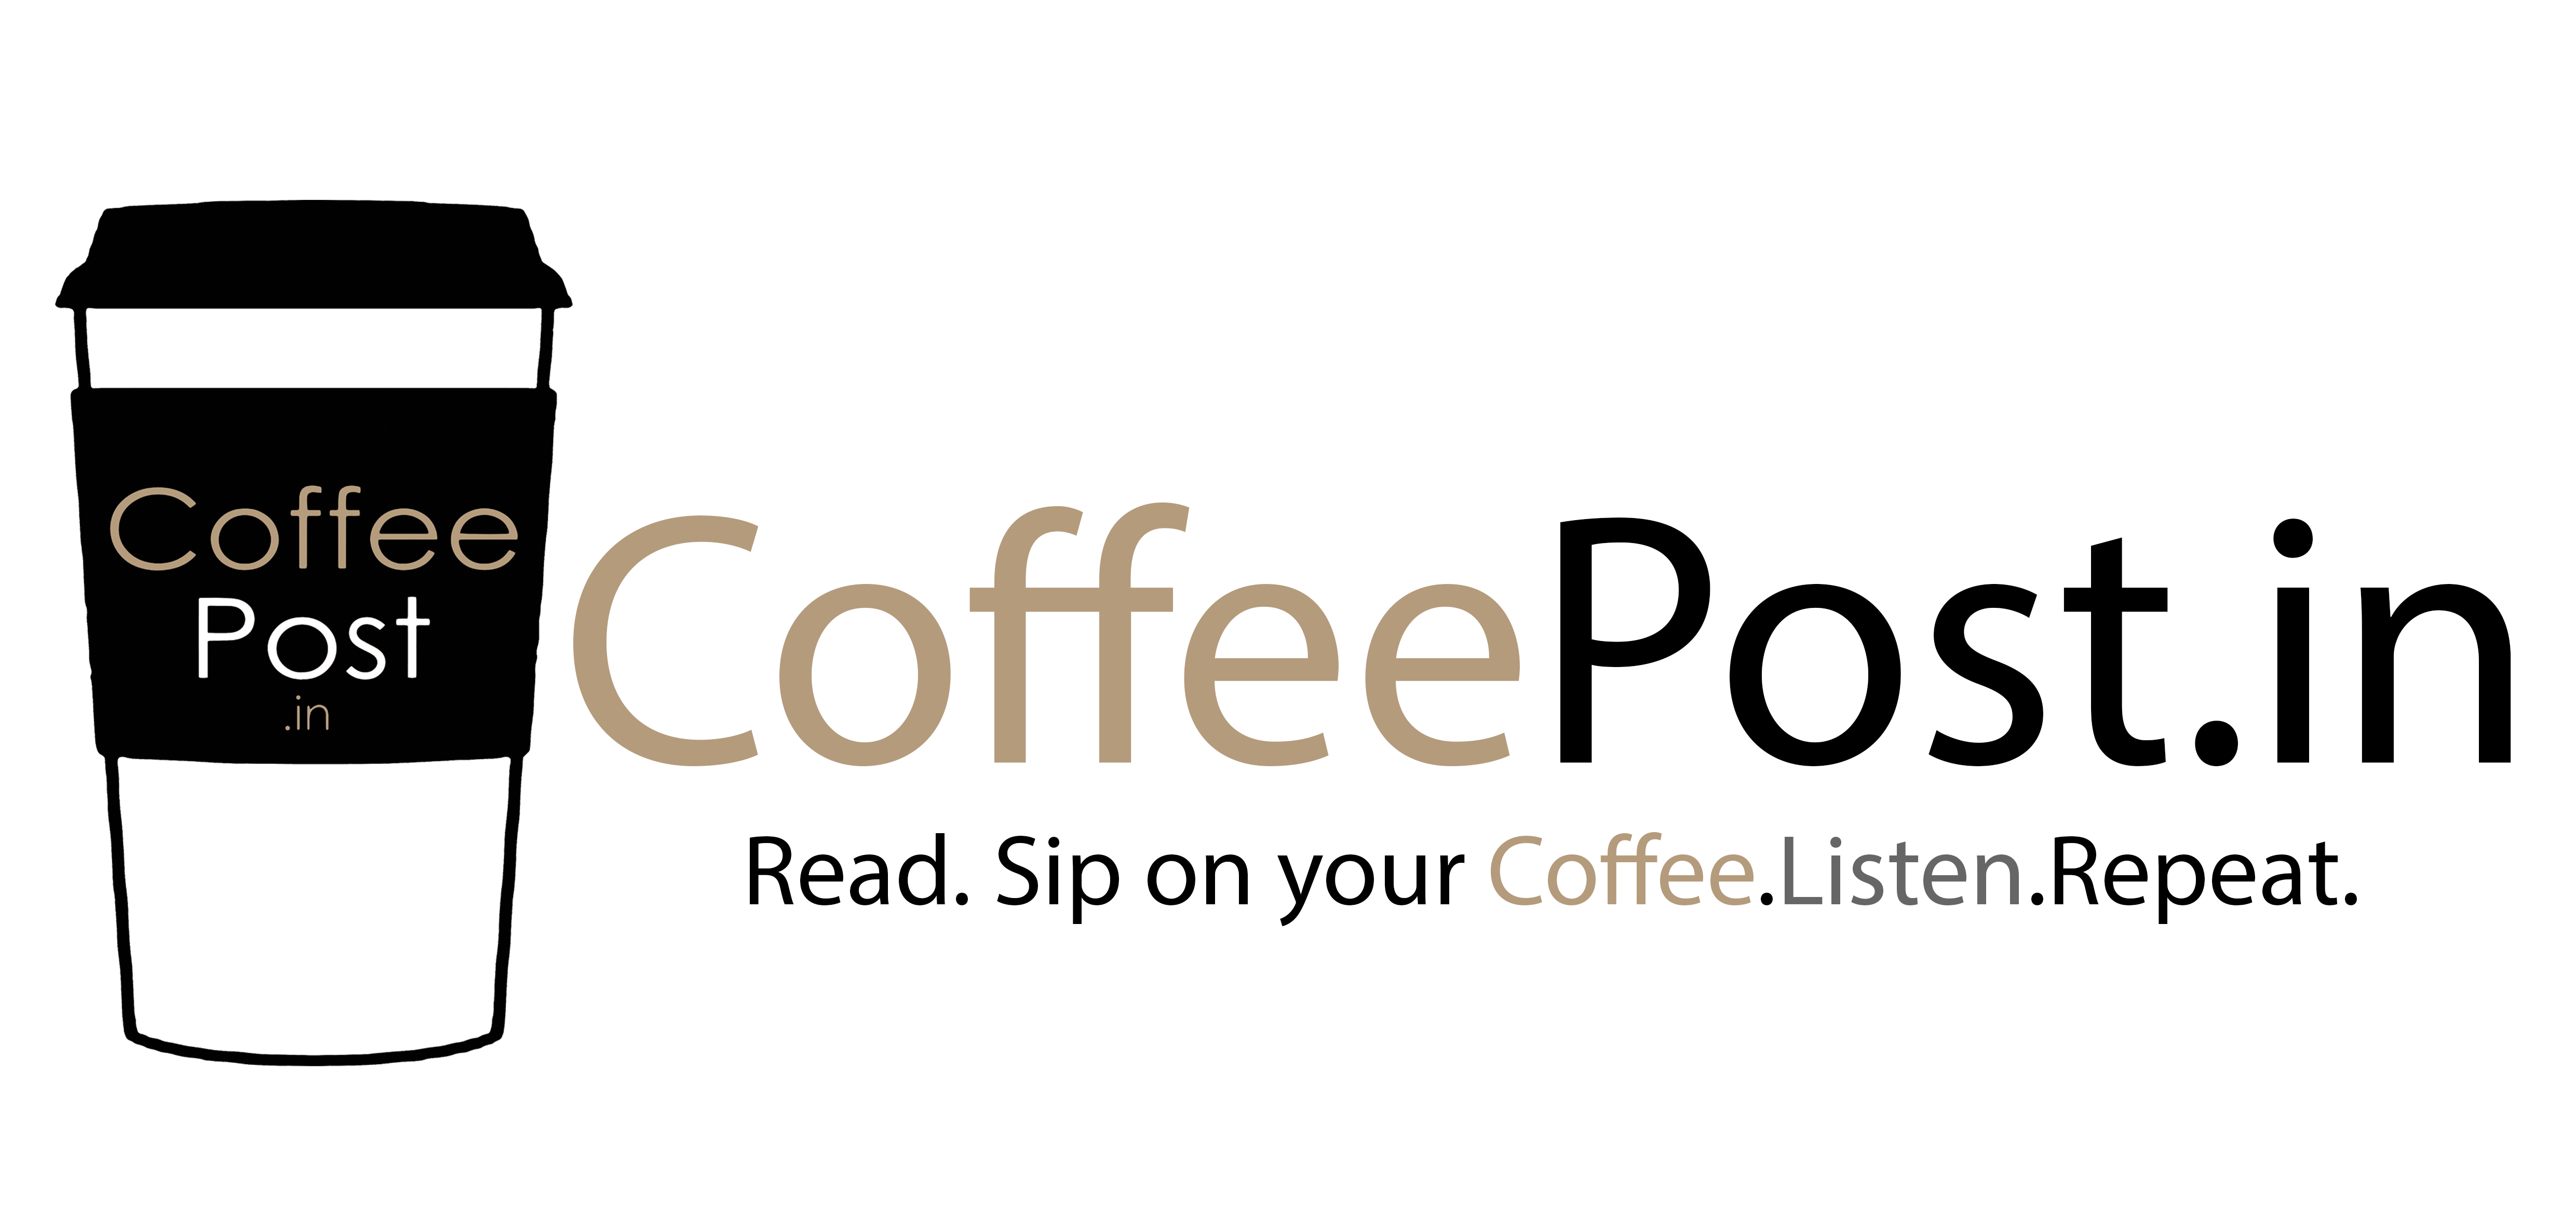 Coffeepost